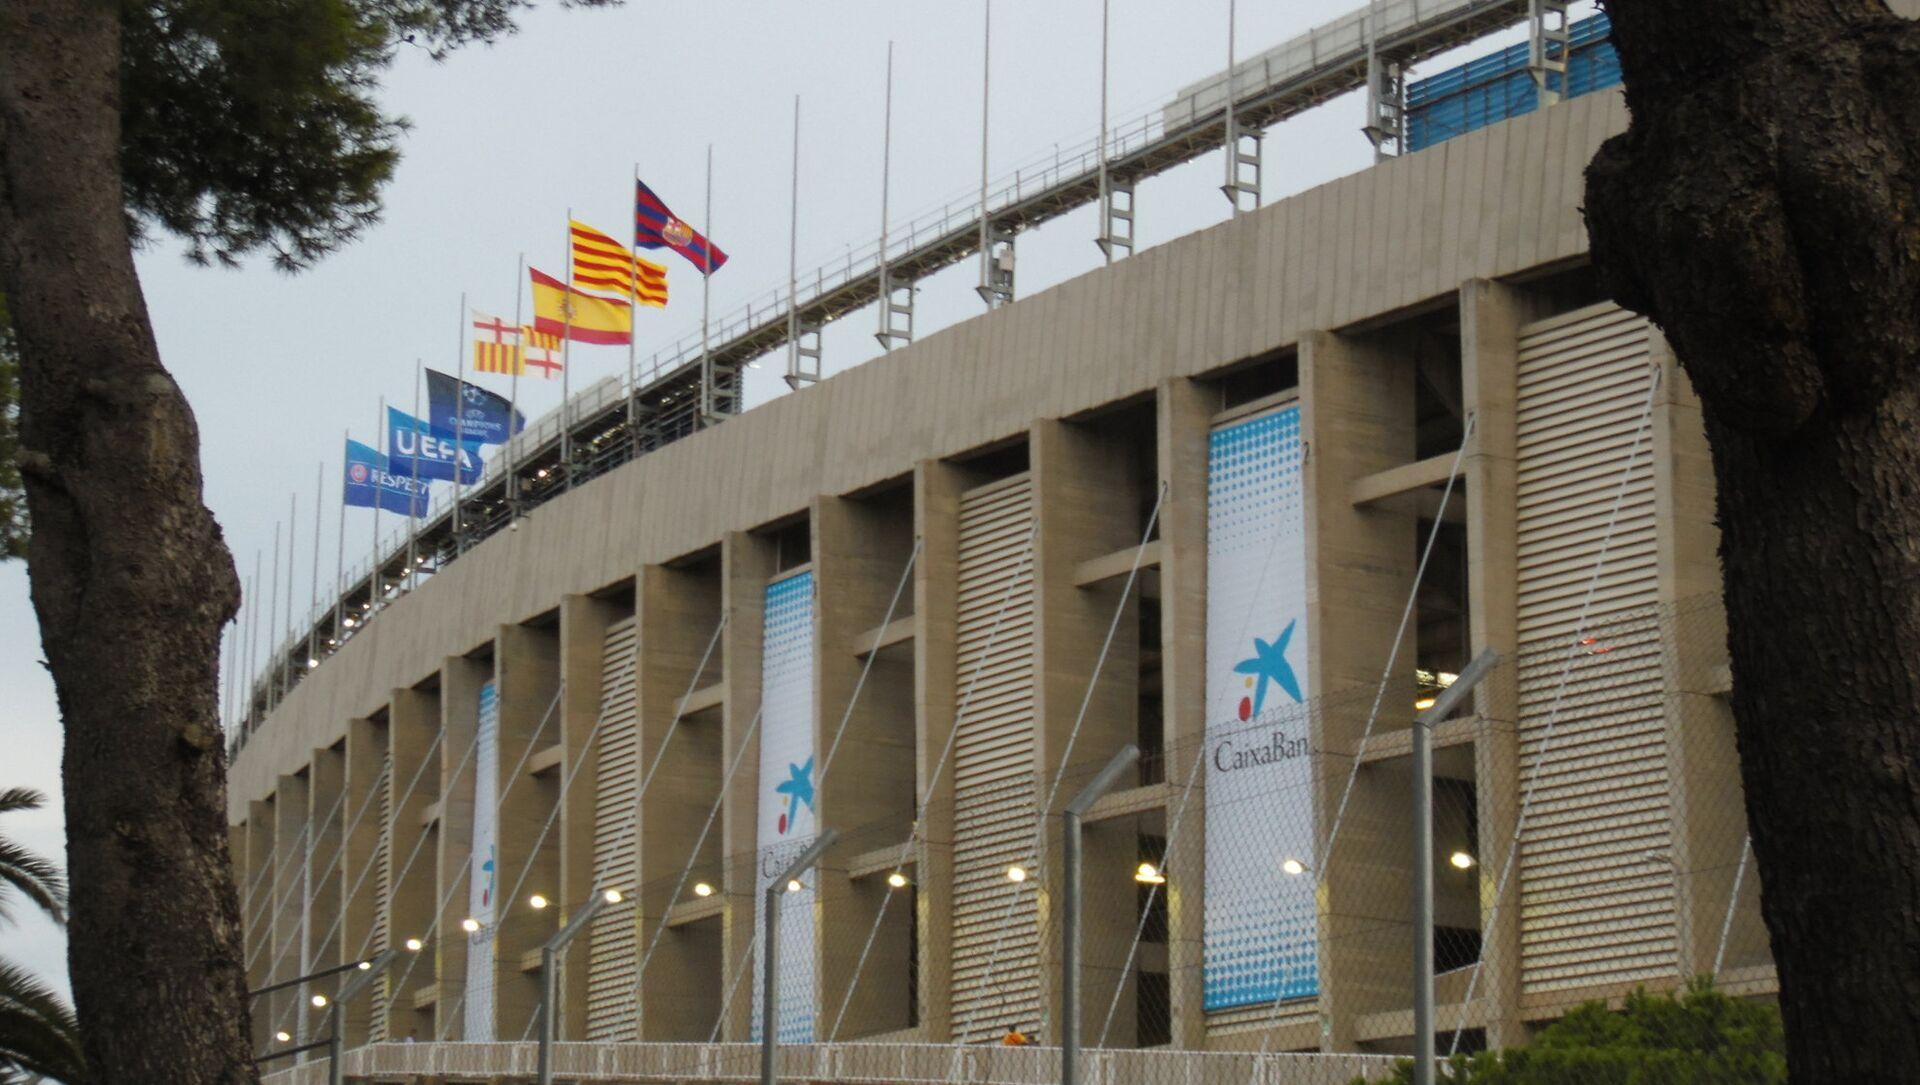 El estadio Camp Nou, Barcelona - Sputnik Mundo, 1920, 09.02.2021